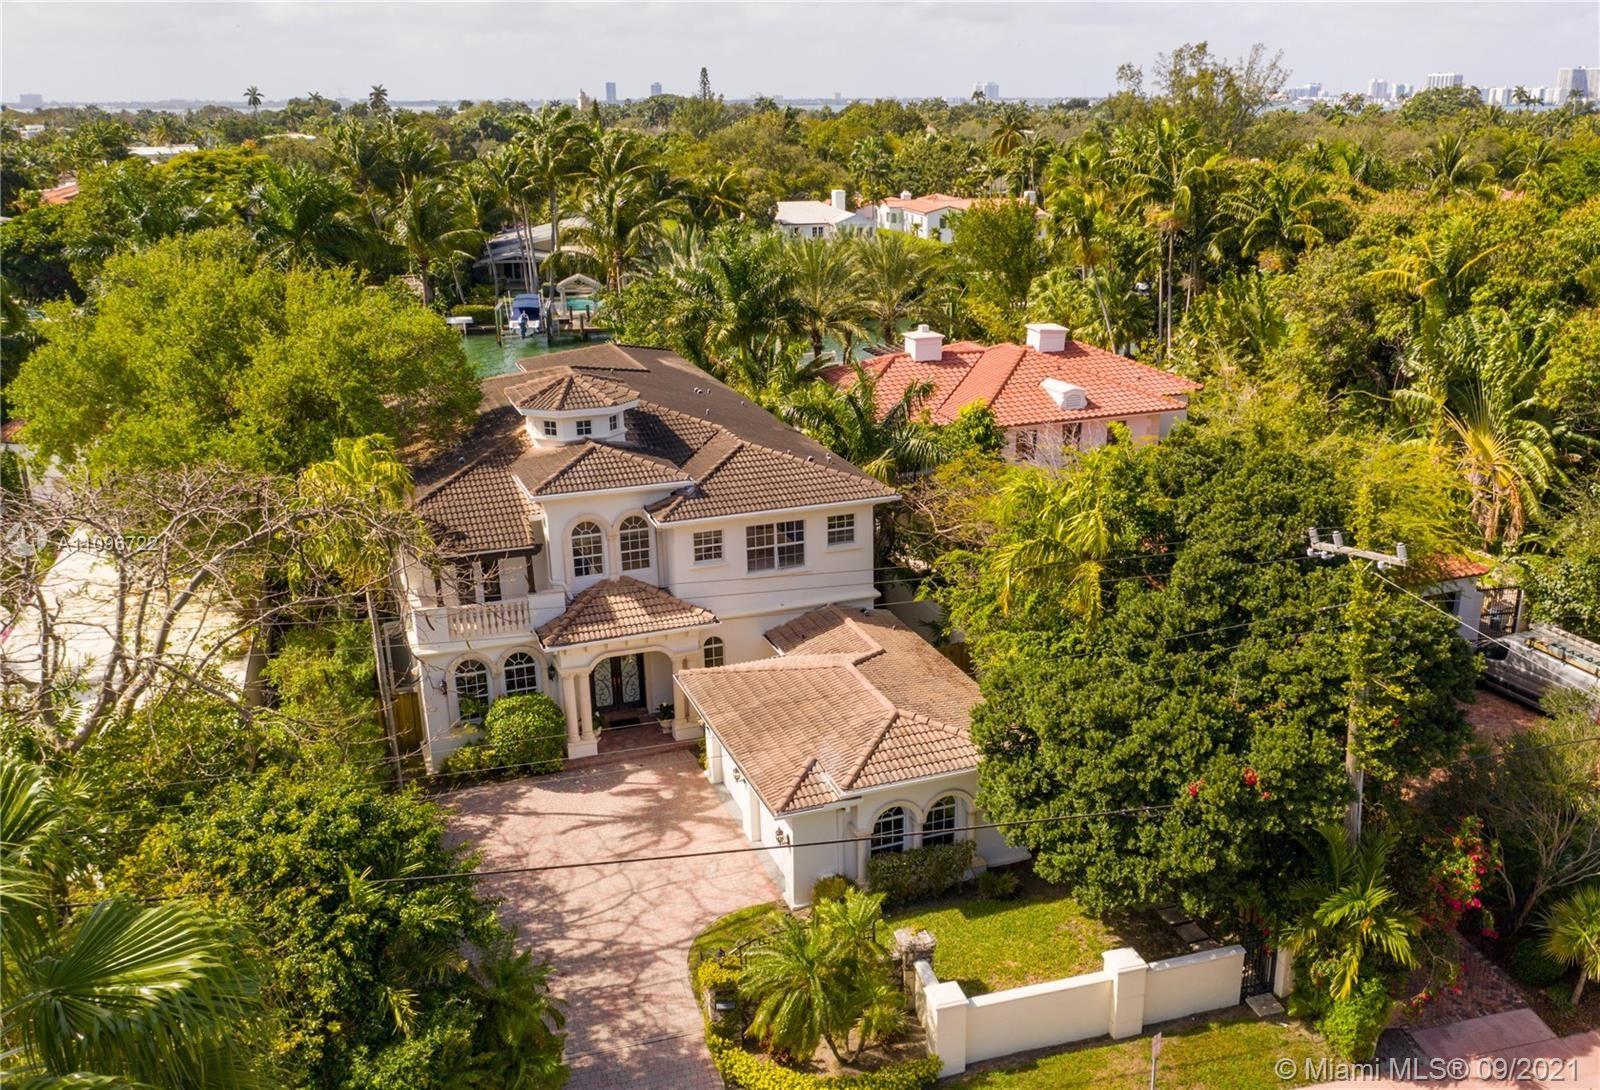 4900 Pine Tree Dr, Miami Beach, FL 33140 - #: A11096722